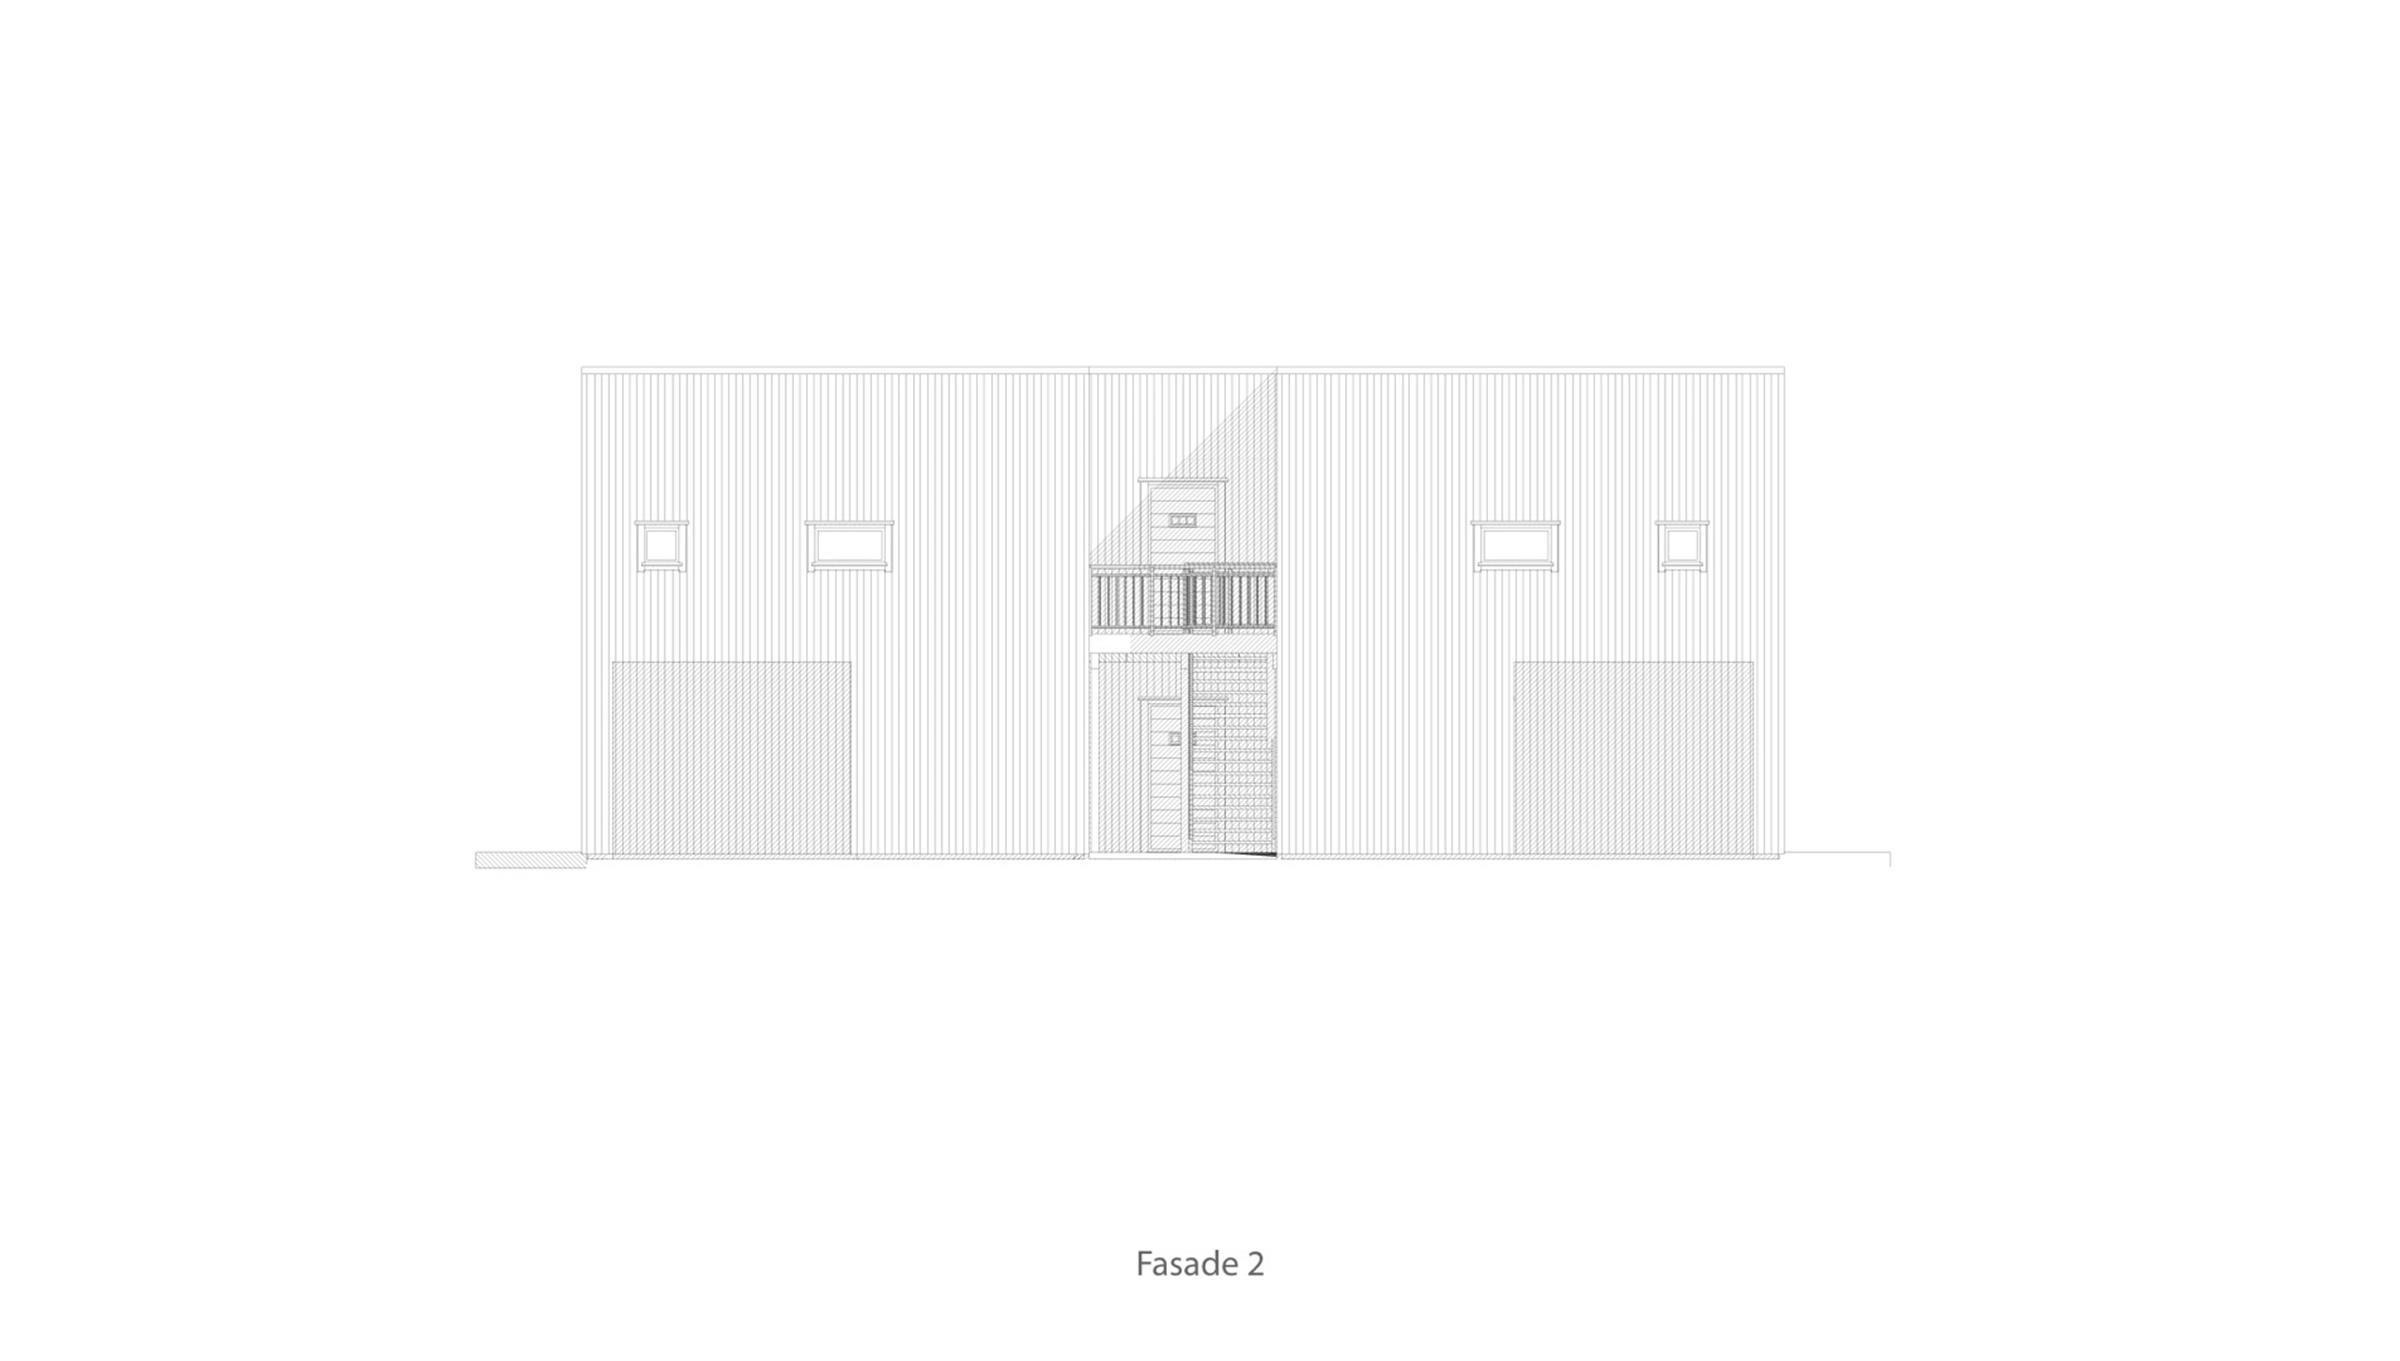 Moelv fasade 2